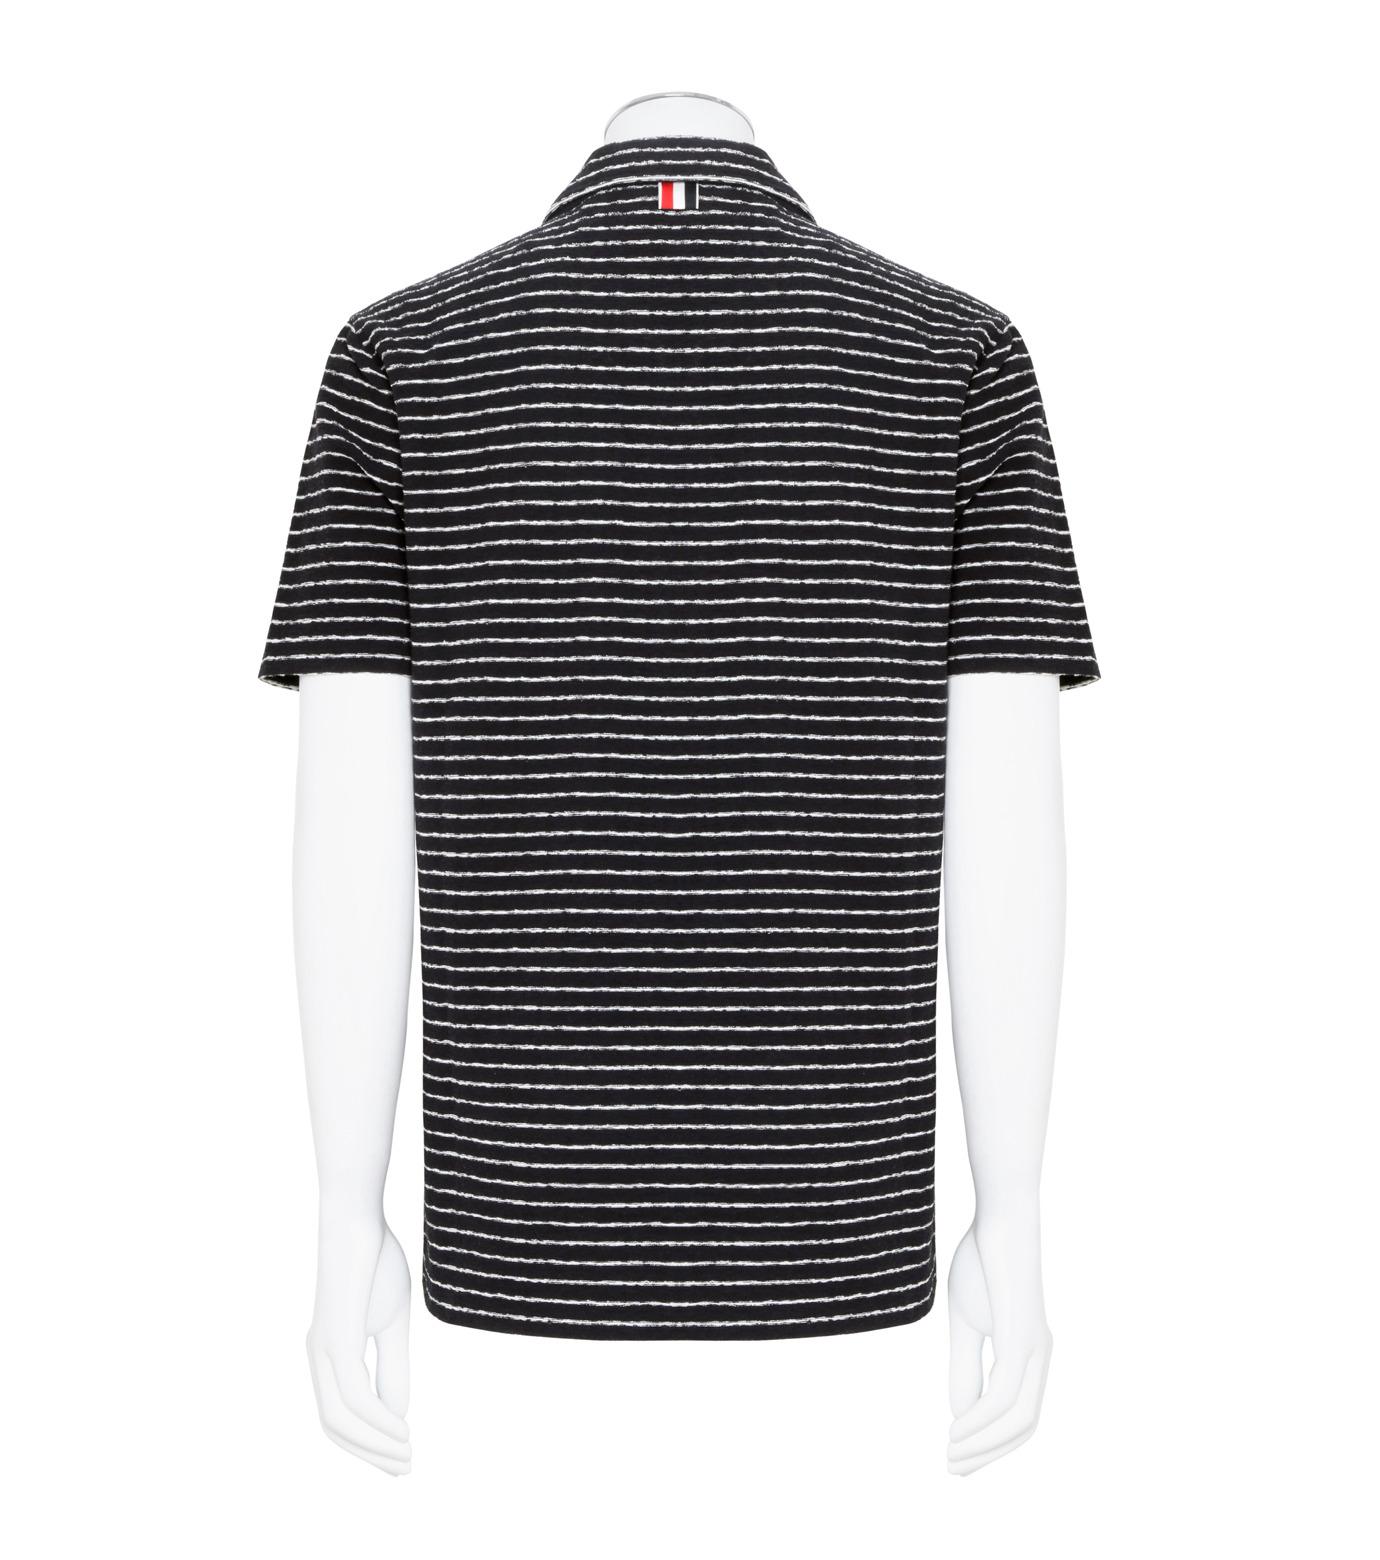 Thom Browne(トムブラウン)のChalk Stripe Polo-NAVY(カットソー/cut and sewn)-MJP032A01429-93 拡大詳細画像2